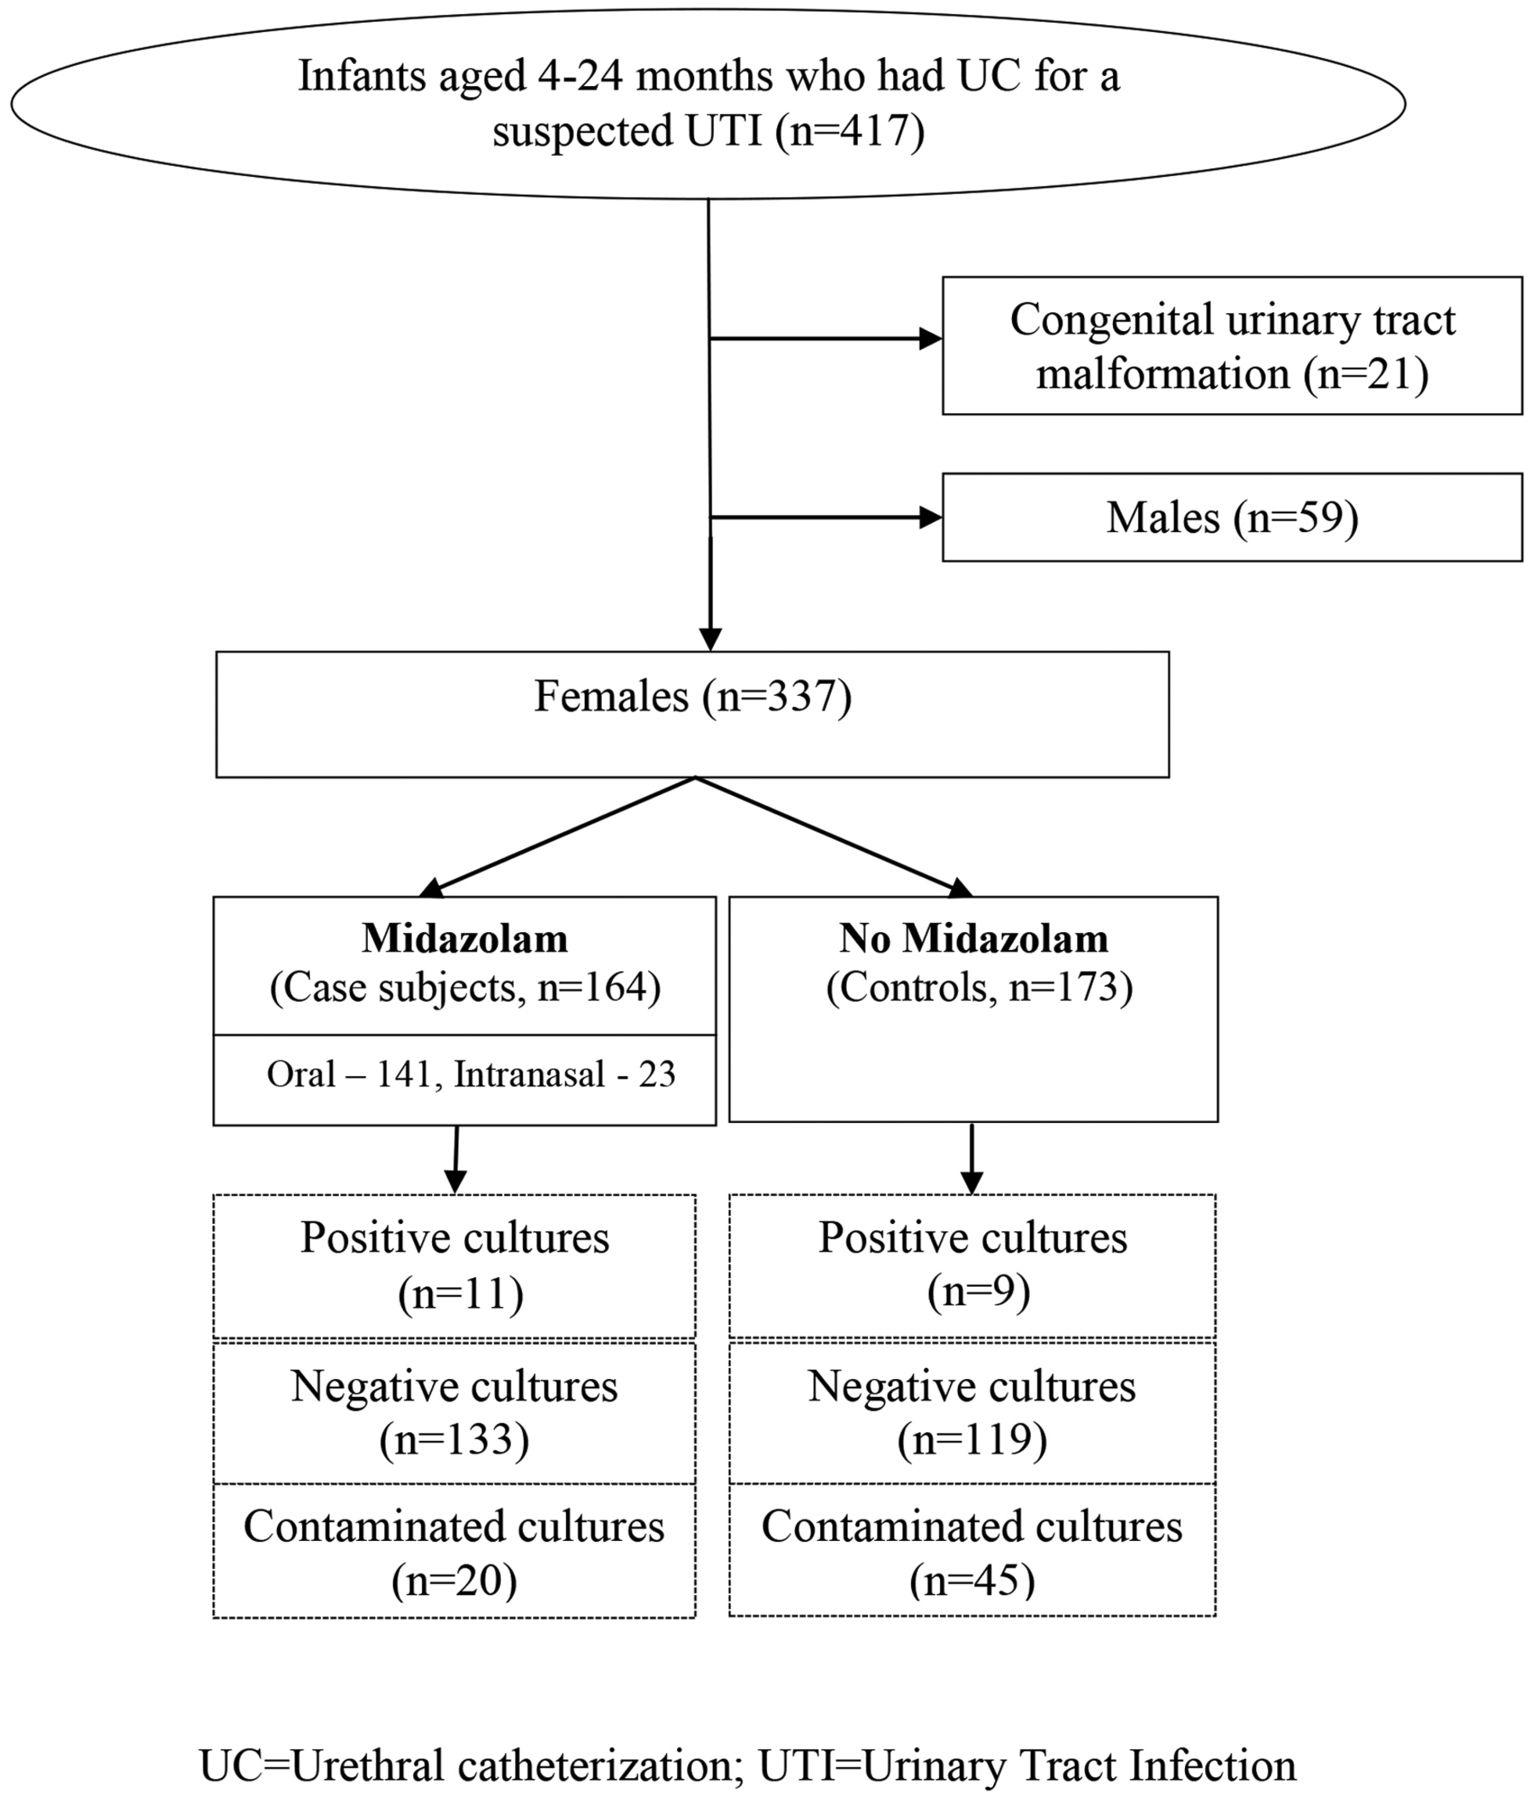 Midazolam for urethral catheterisation in female infants